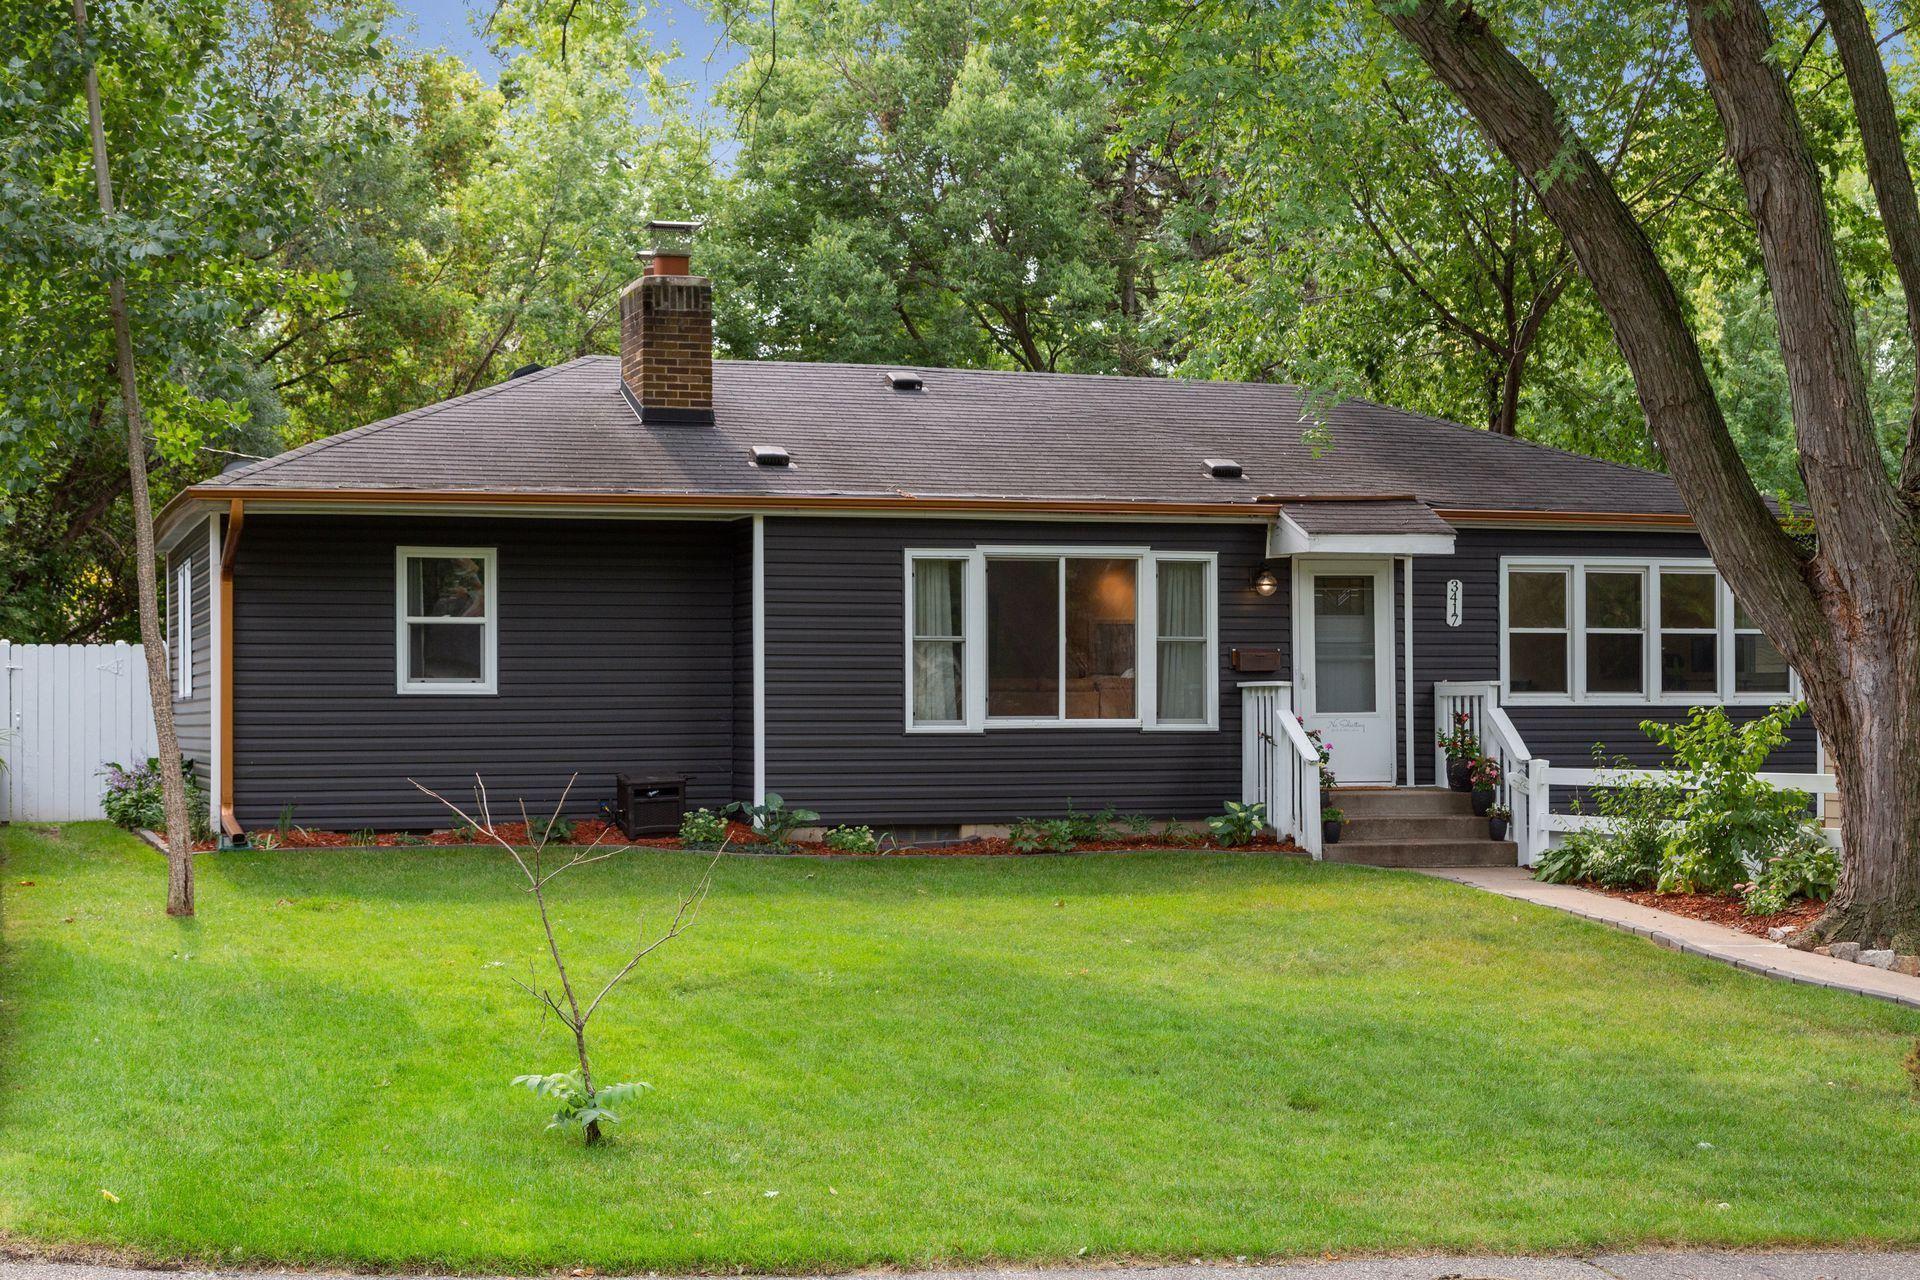 3417 Terrace Lane, Golden Valley, MN 55422 - MLS#: 5656429